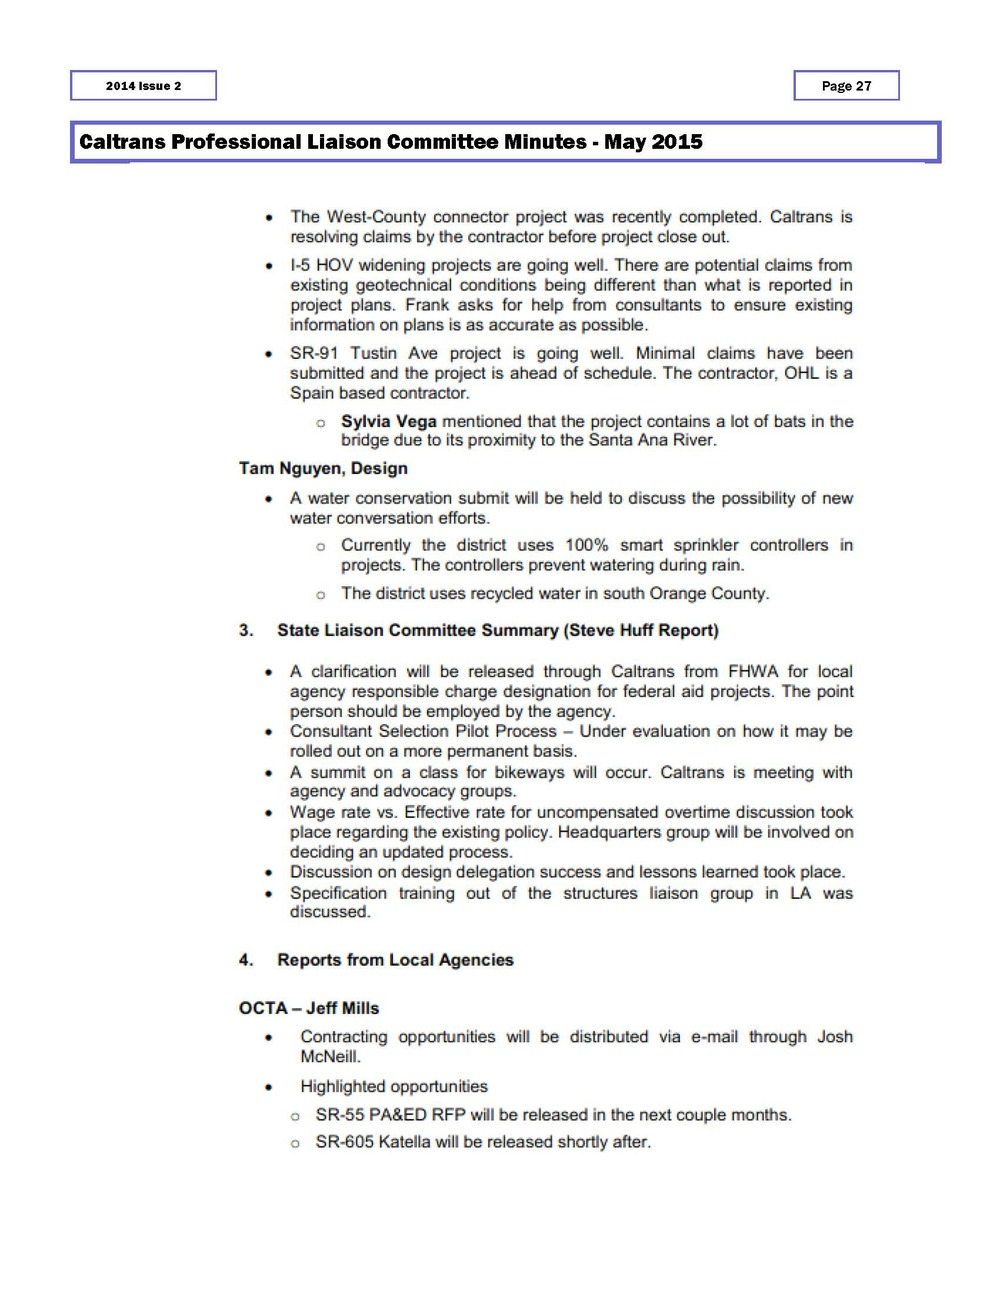 OC-CLSA 082015 Newsletter_Page_33.jpg